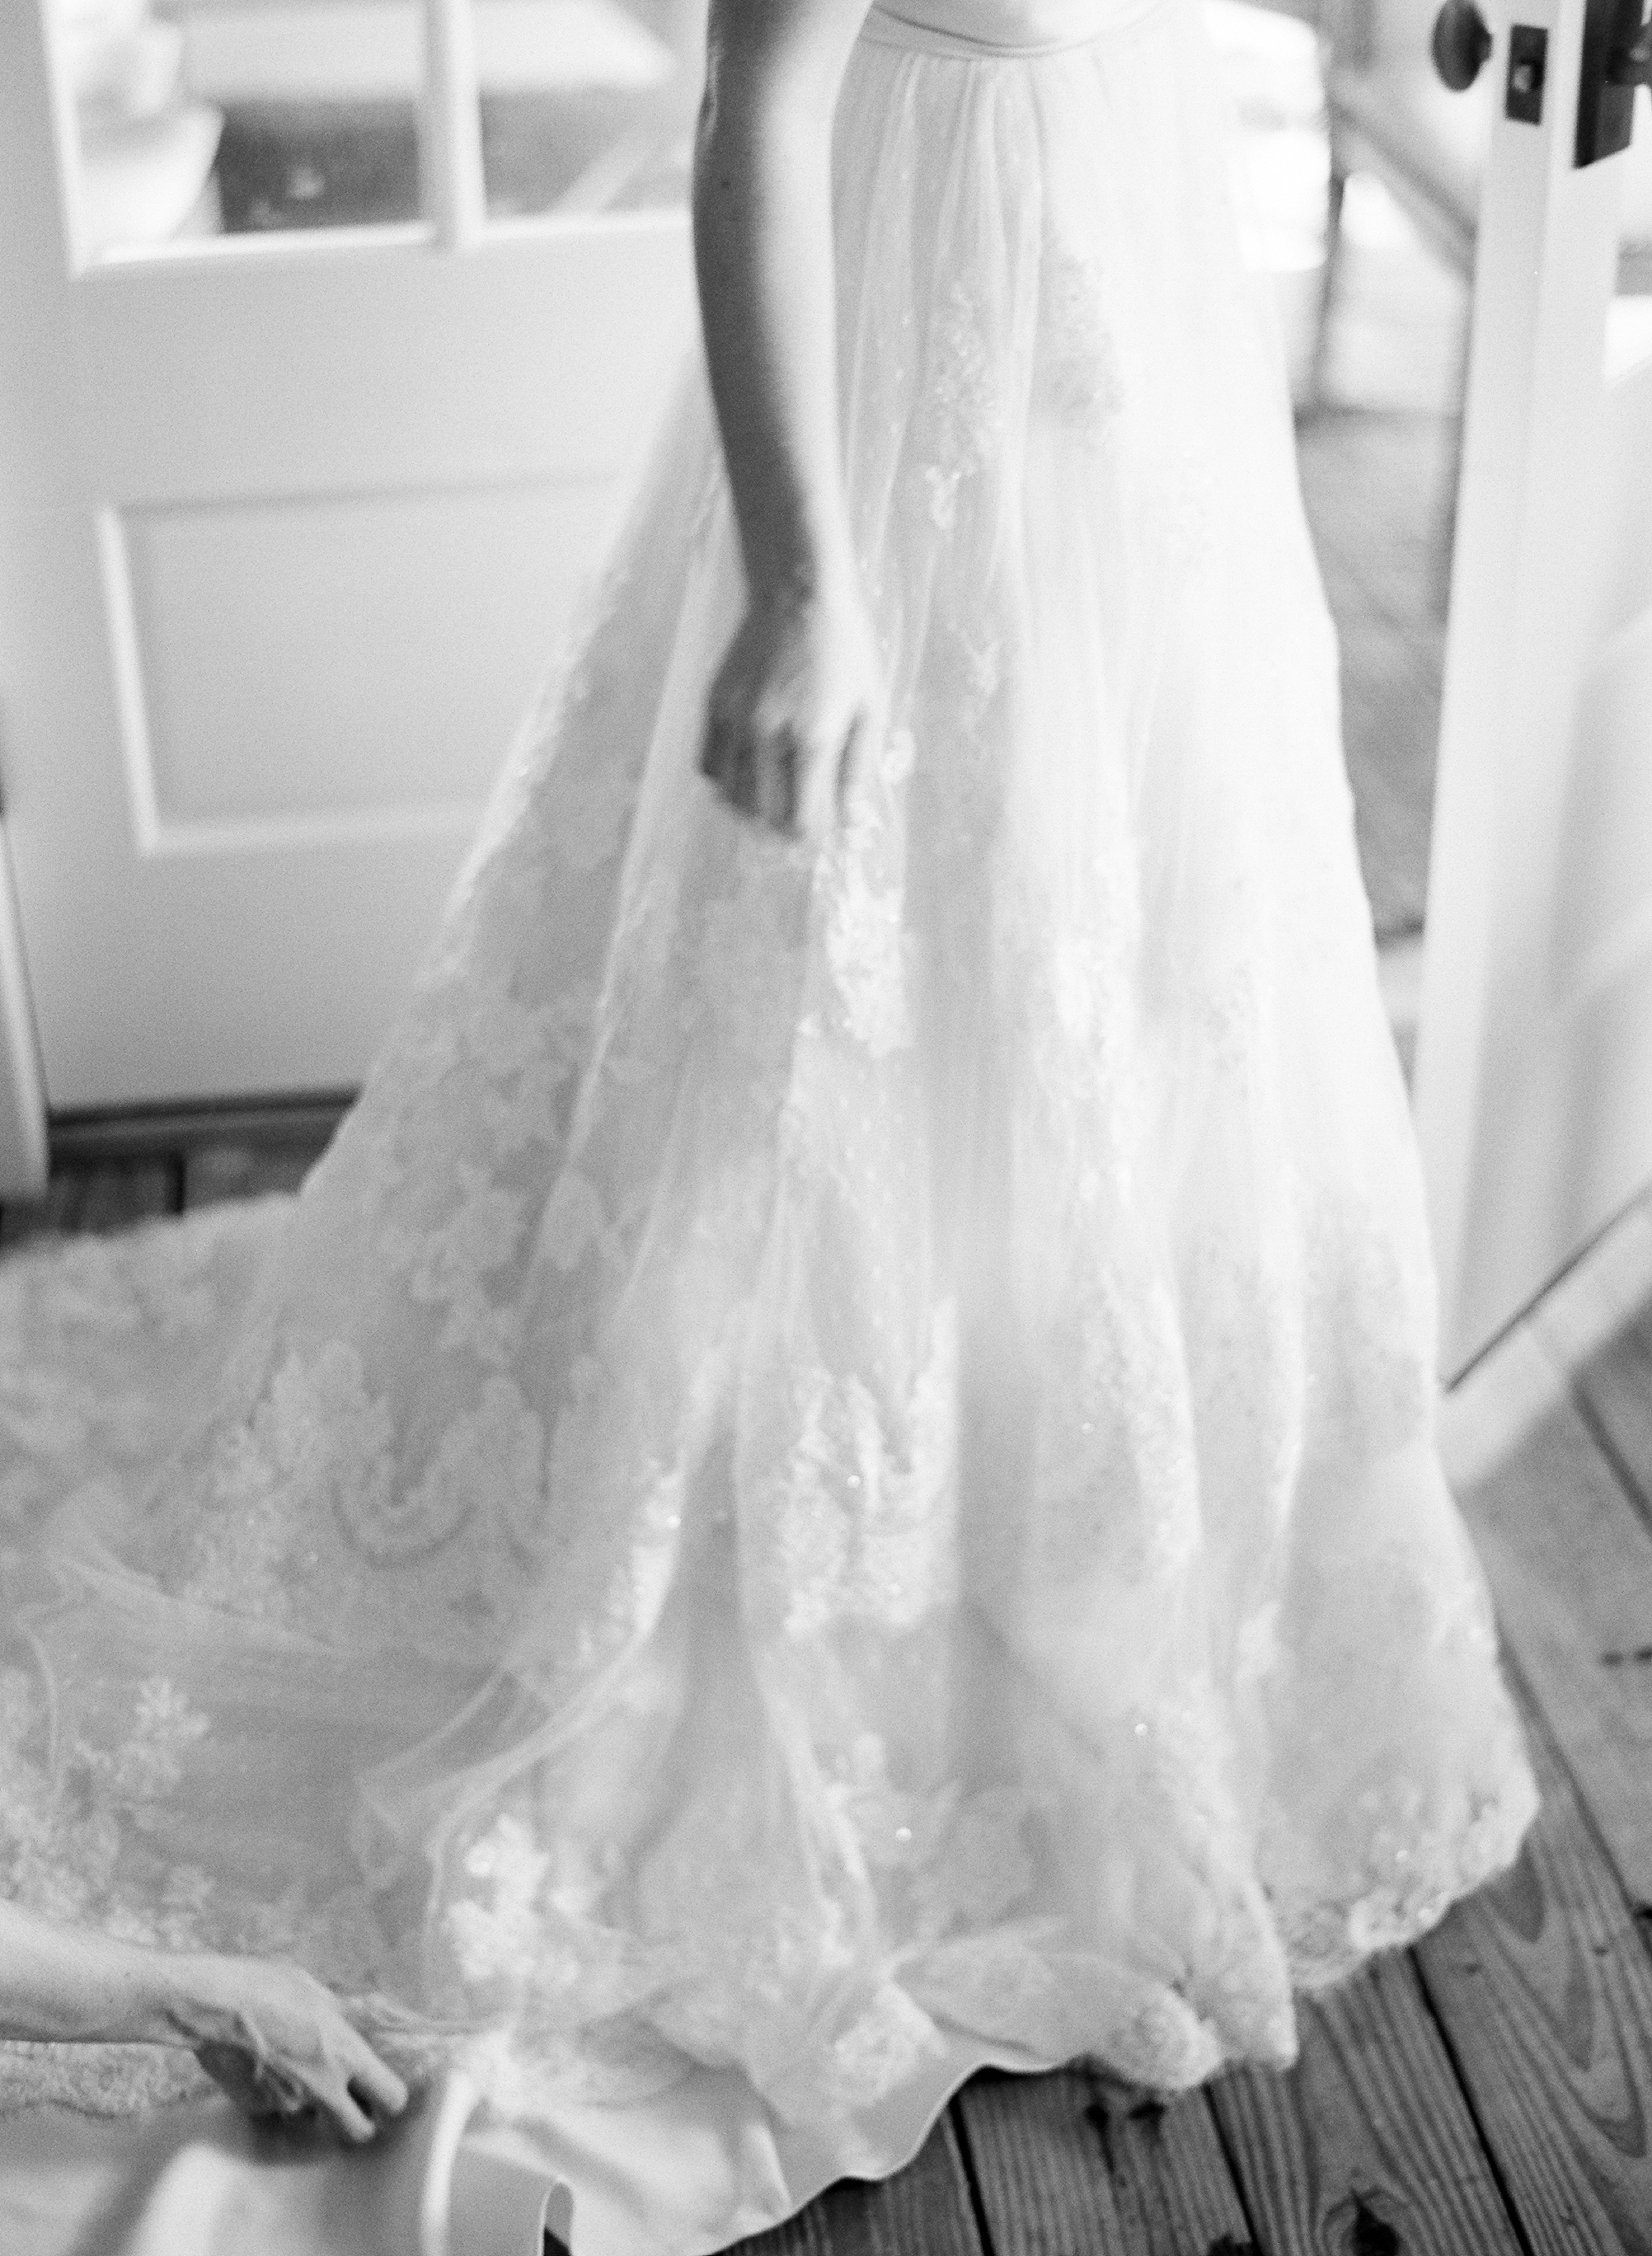 st_simons_island_wedding_photographer_shannon_griffin_0006.jpg